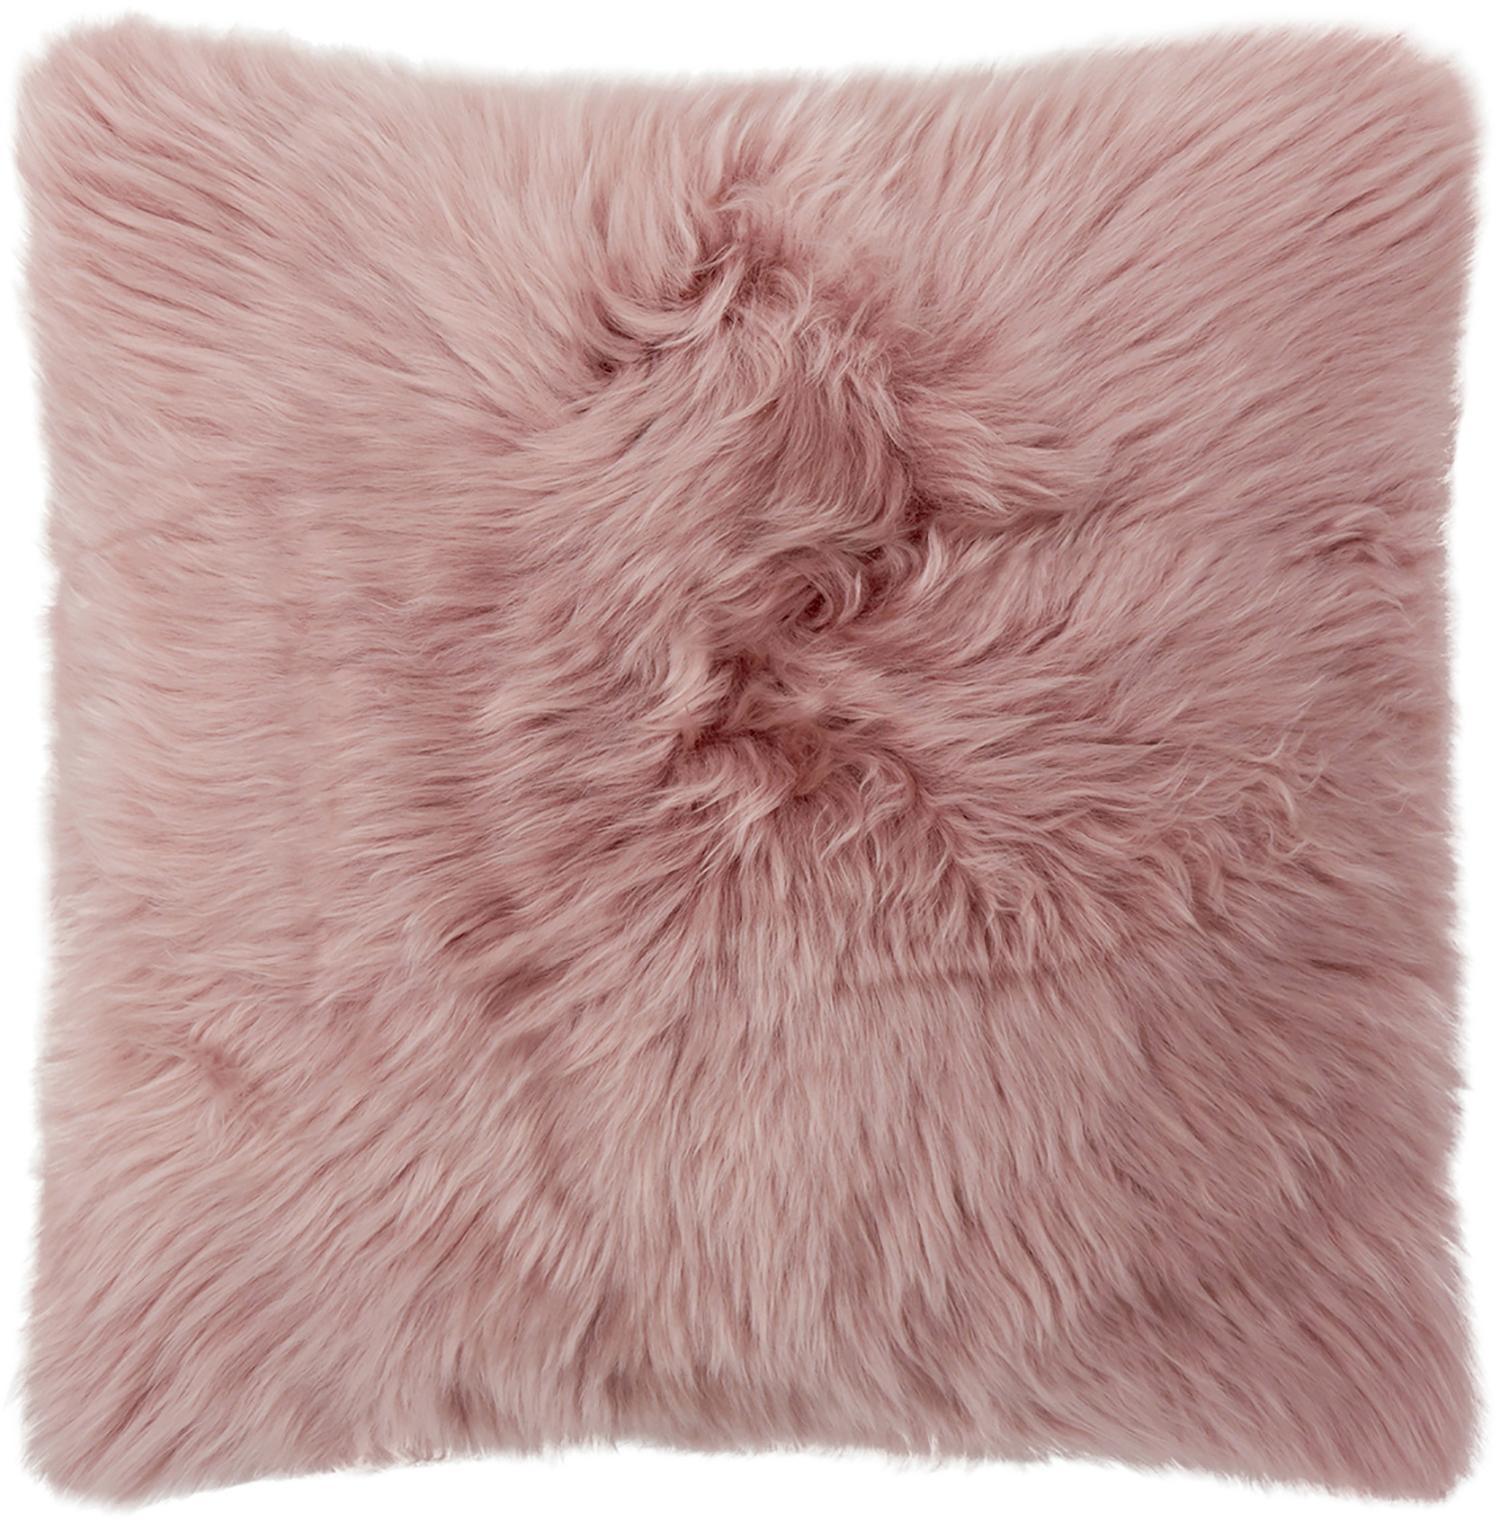 Funda de cojín de piel de oveja Oslo, Parte delantera: piel de oveja, Parte trasera: lino, Parte delantera: rosa Parte trasera: gris claro, An 40 x L 40 cm